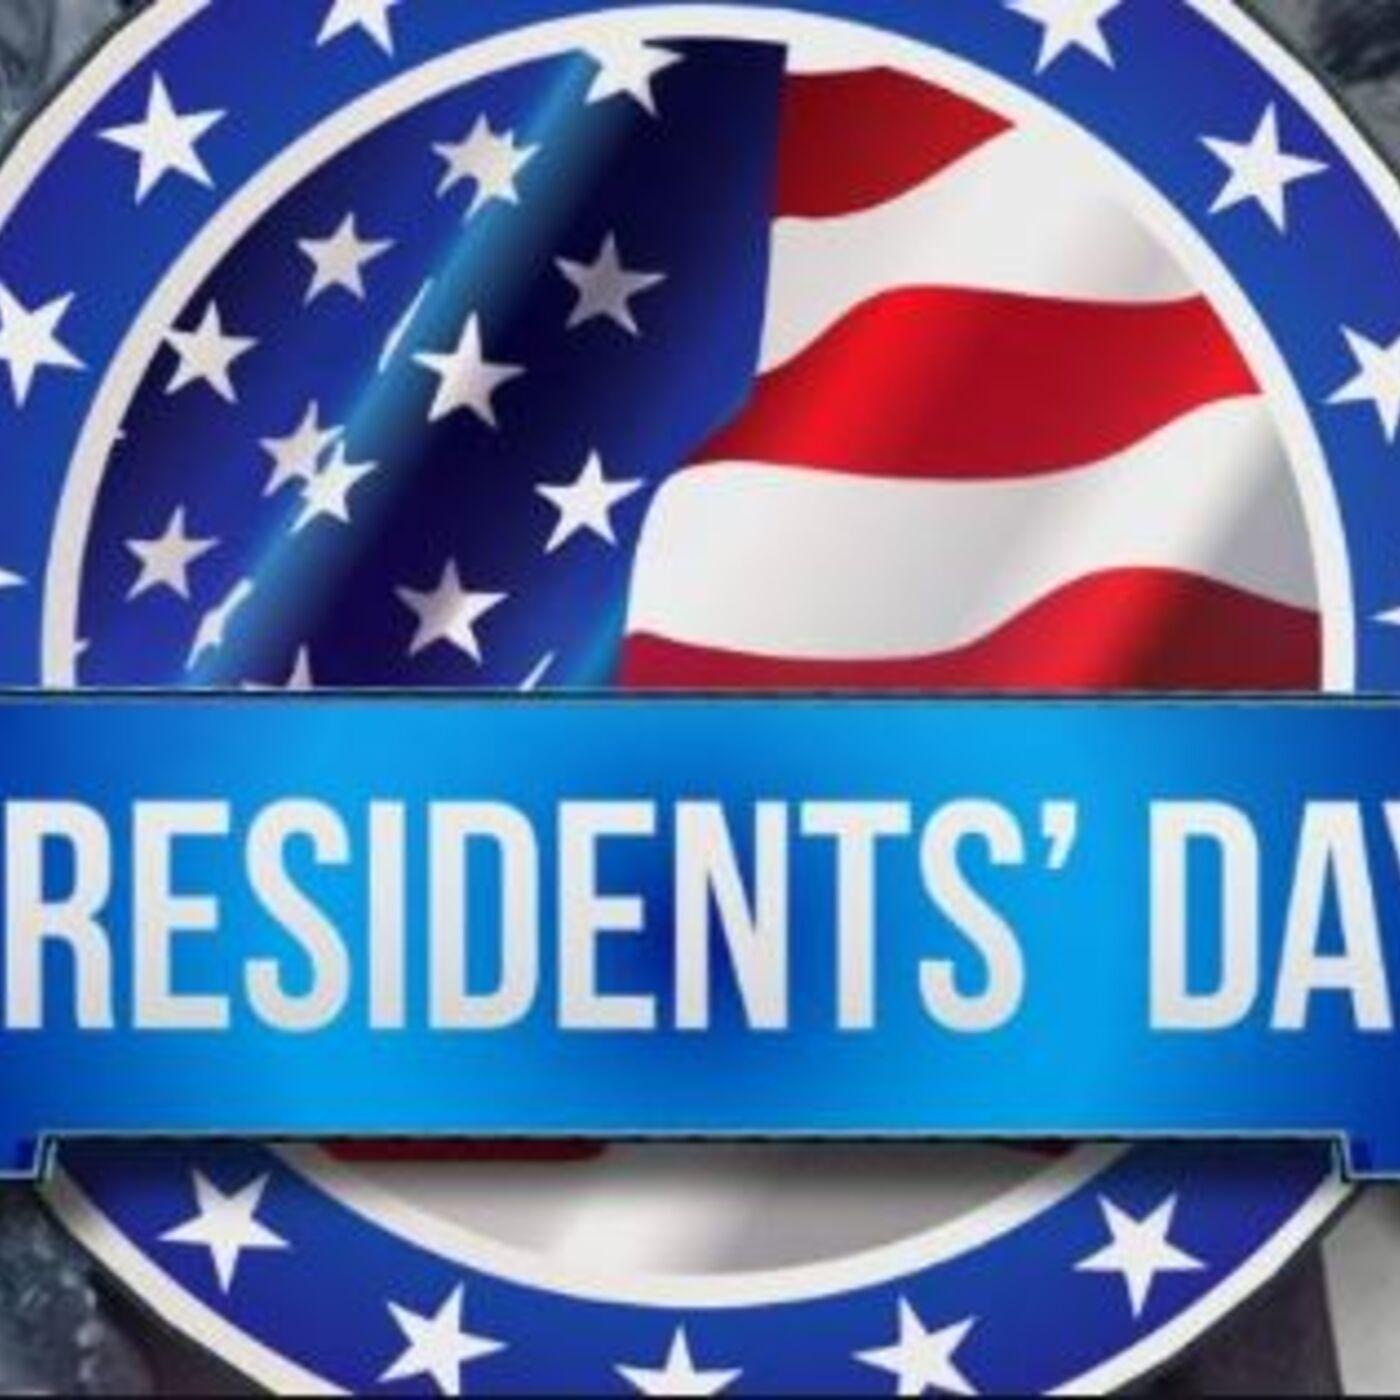 President's Day.